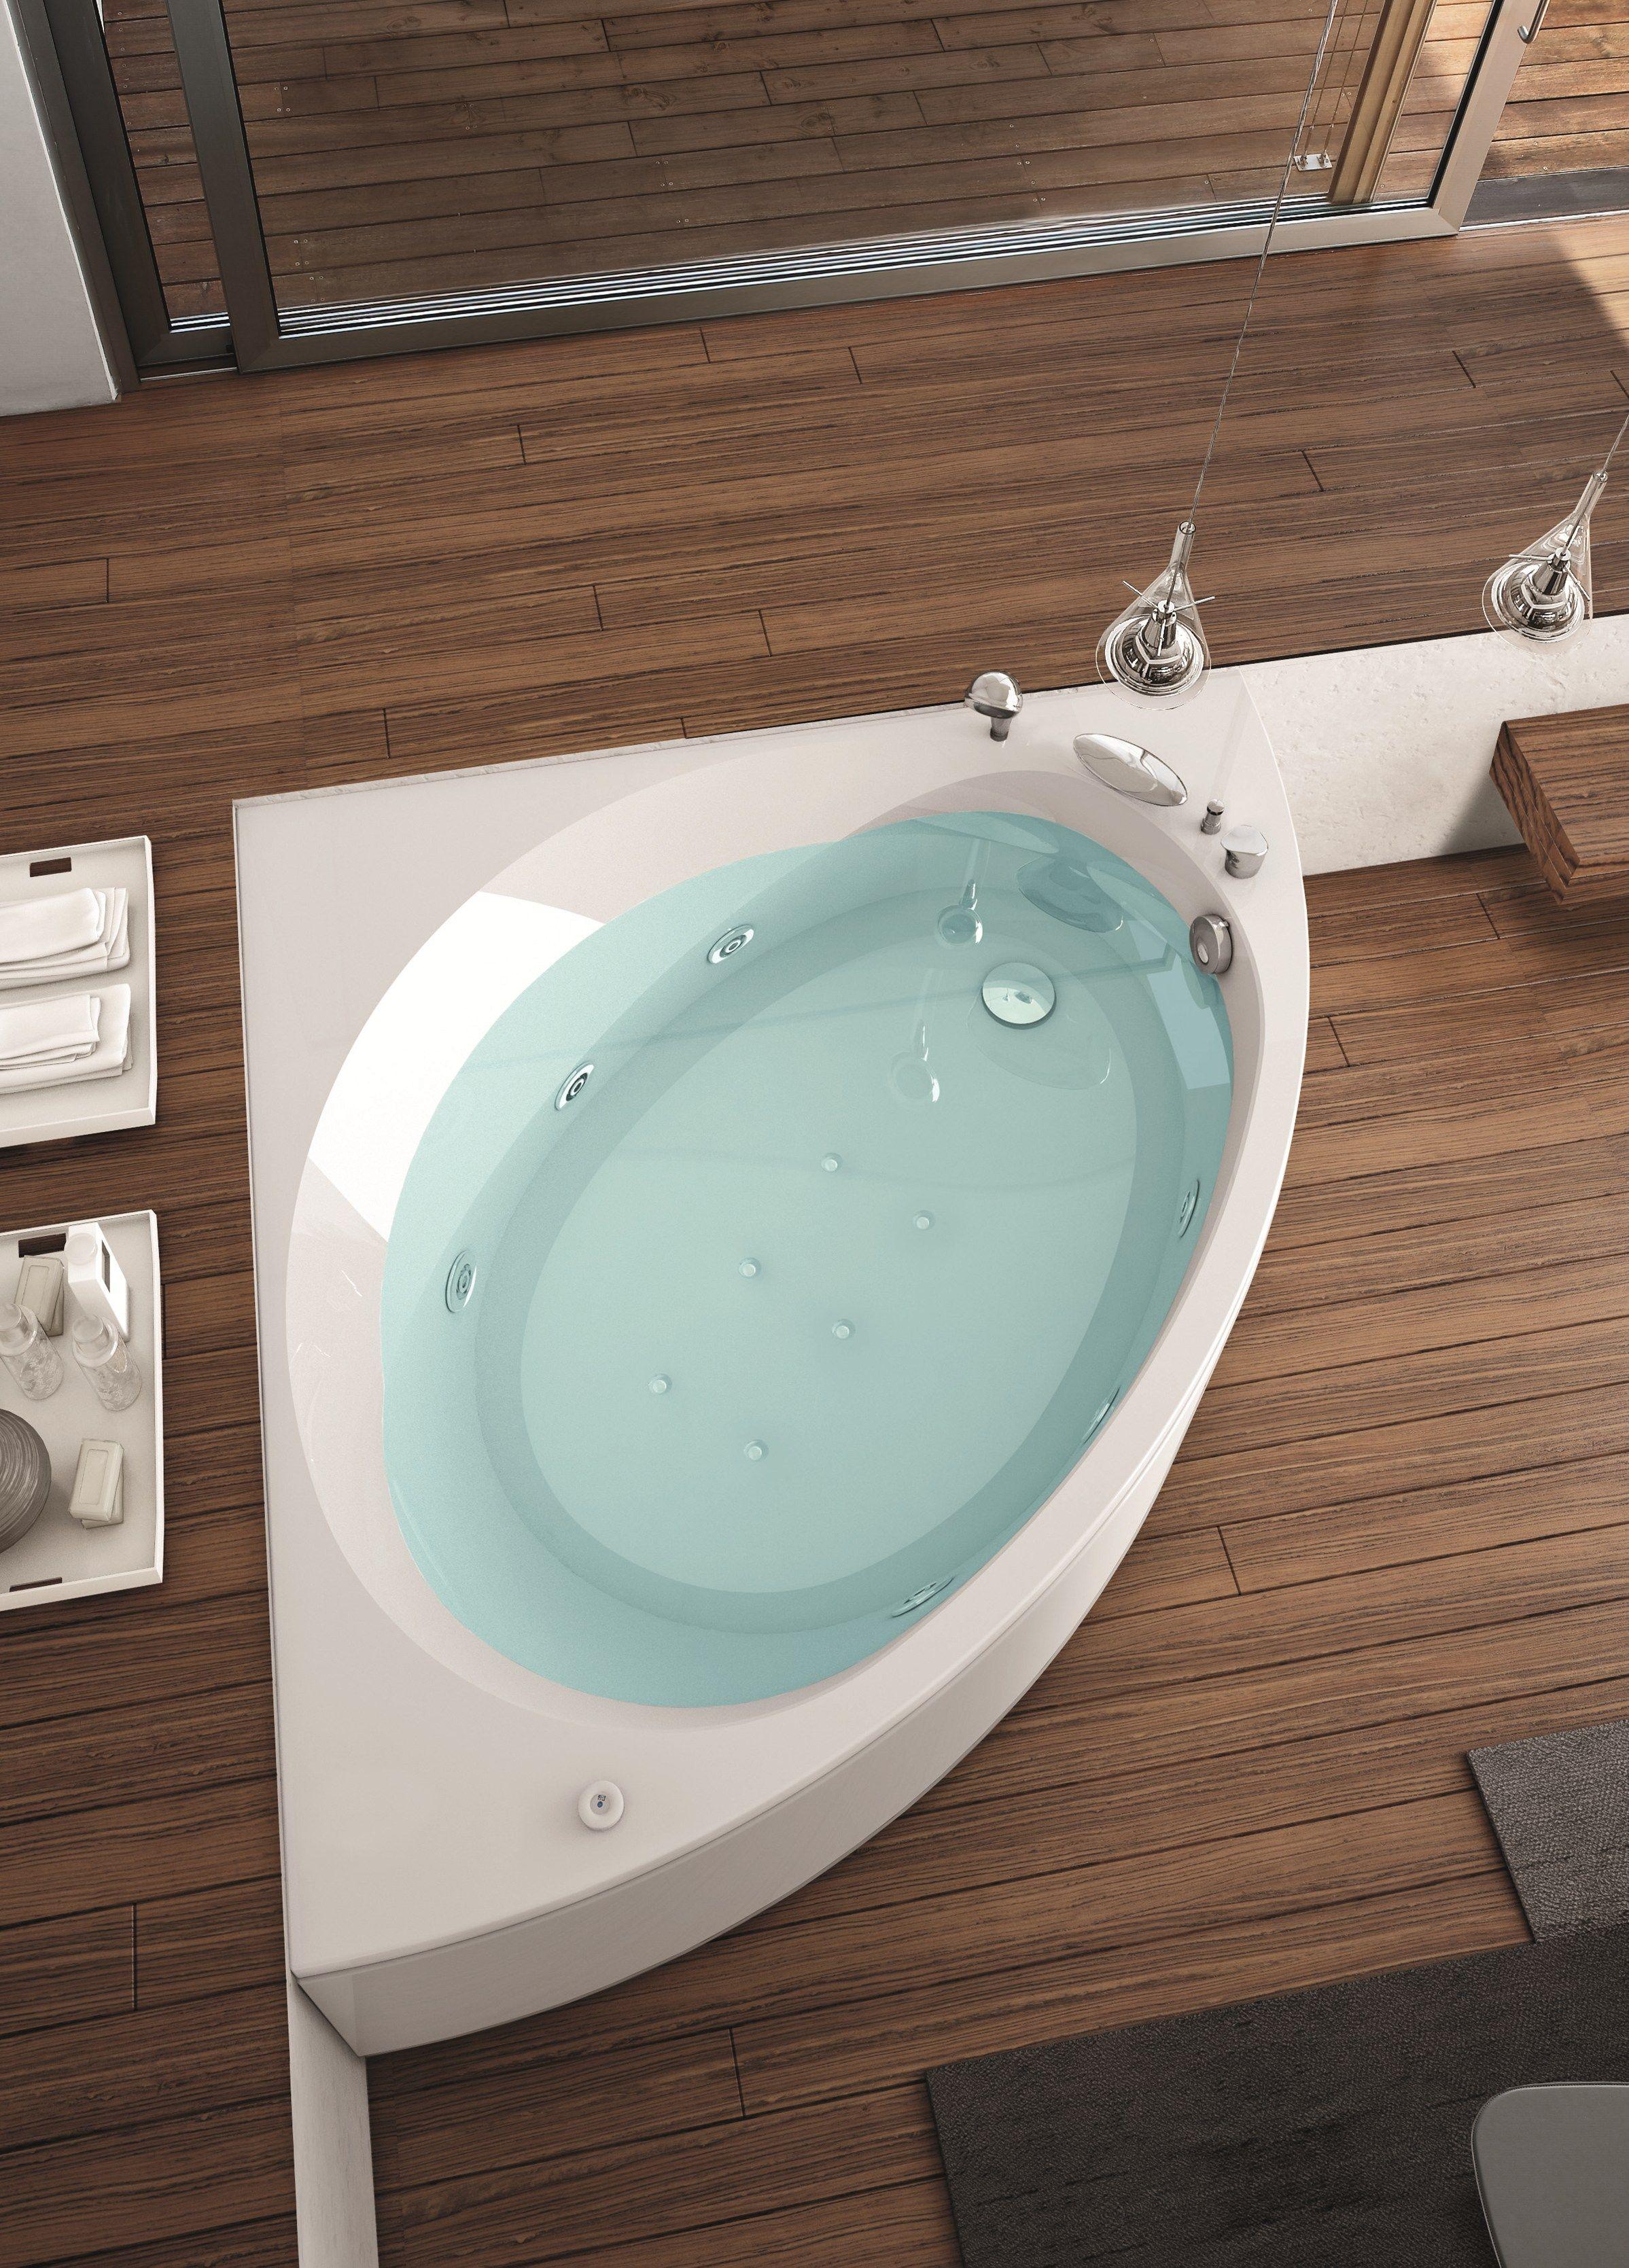 Http Www Archiproducts Com En Products 93986 Nova Corner Whirlpool Bathtub Nova Corner Bathtub Hafro Html Whirlpool Bathtub Corner Bath Modern Bathtub